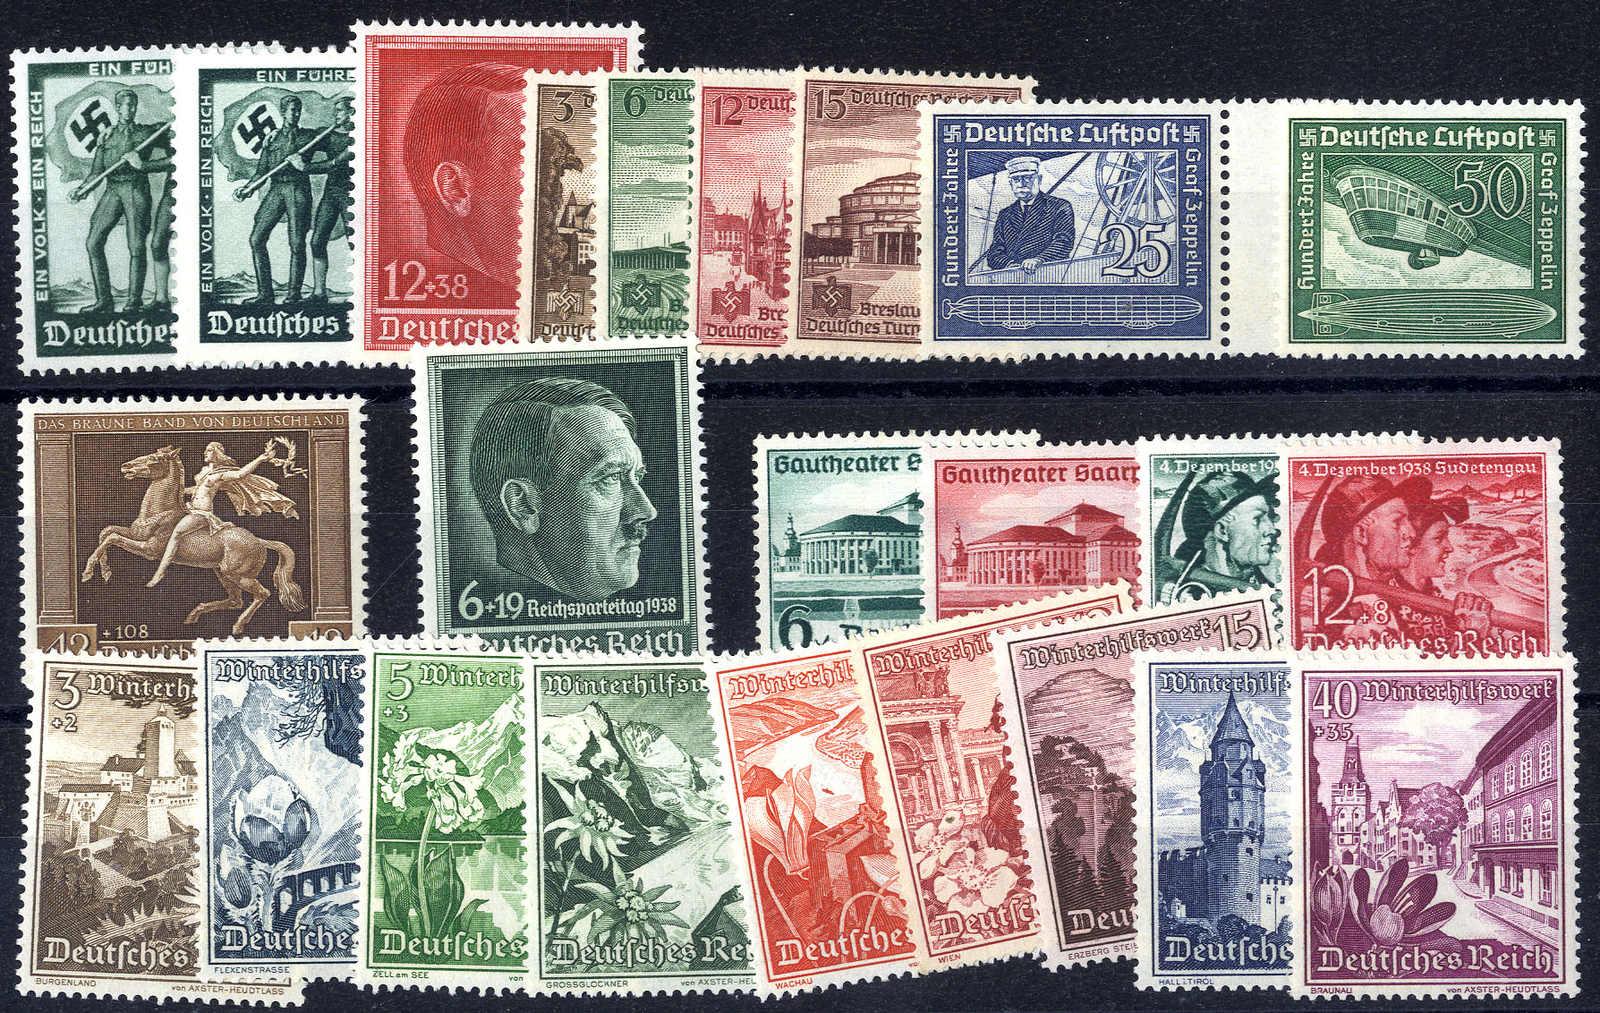 Lot 2902 - germany German Empire -  Viennafil Auktionen 63rd LIVE AUCTION